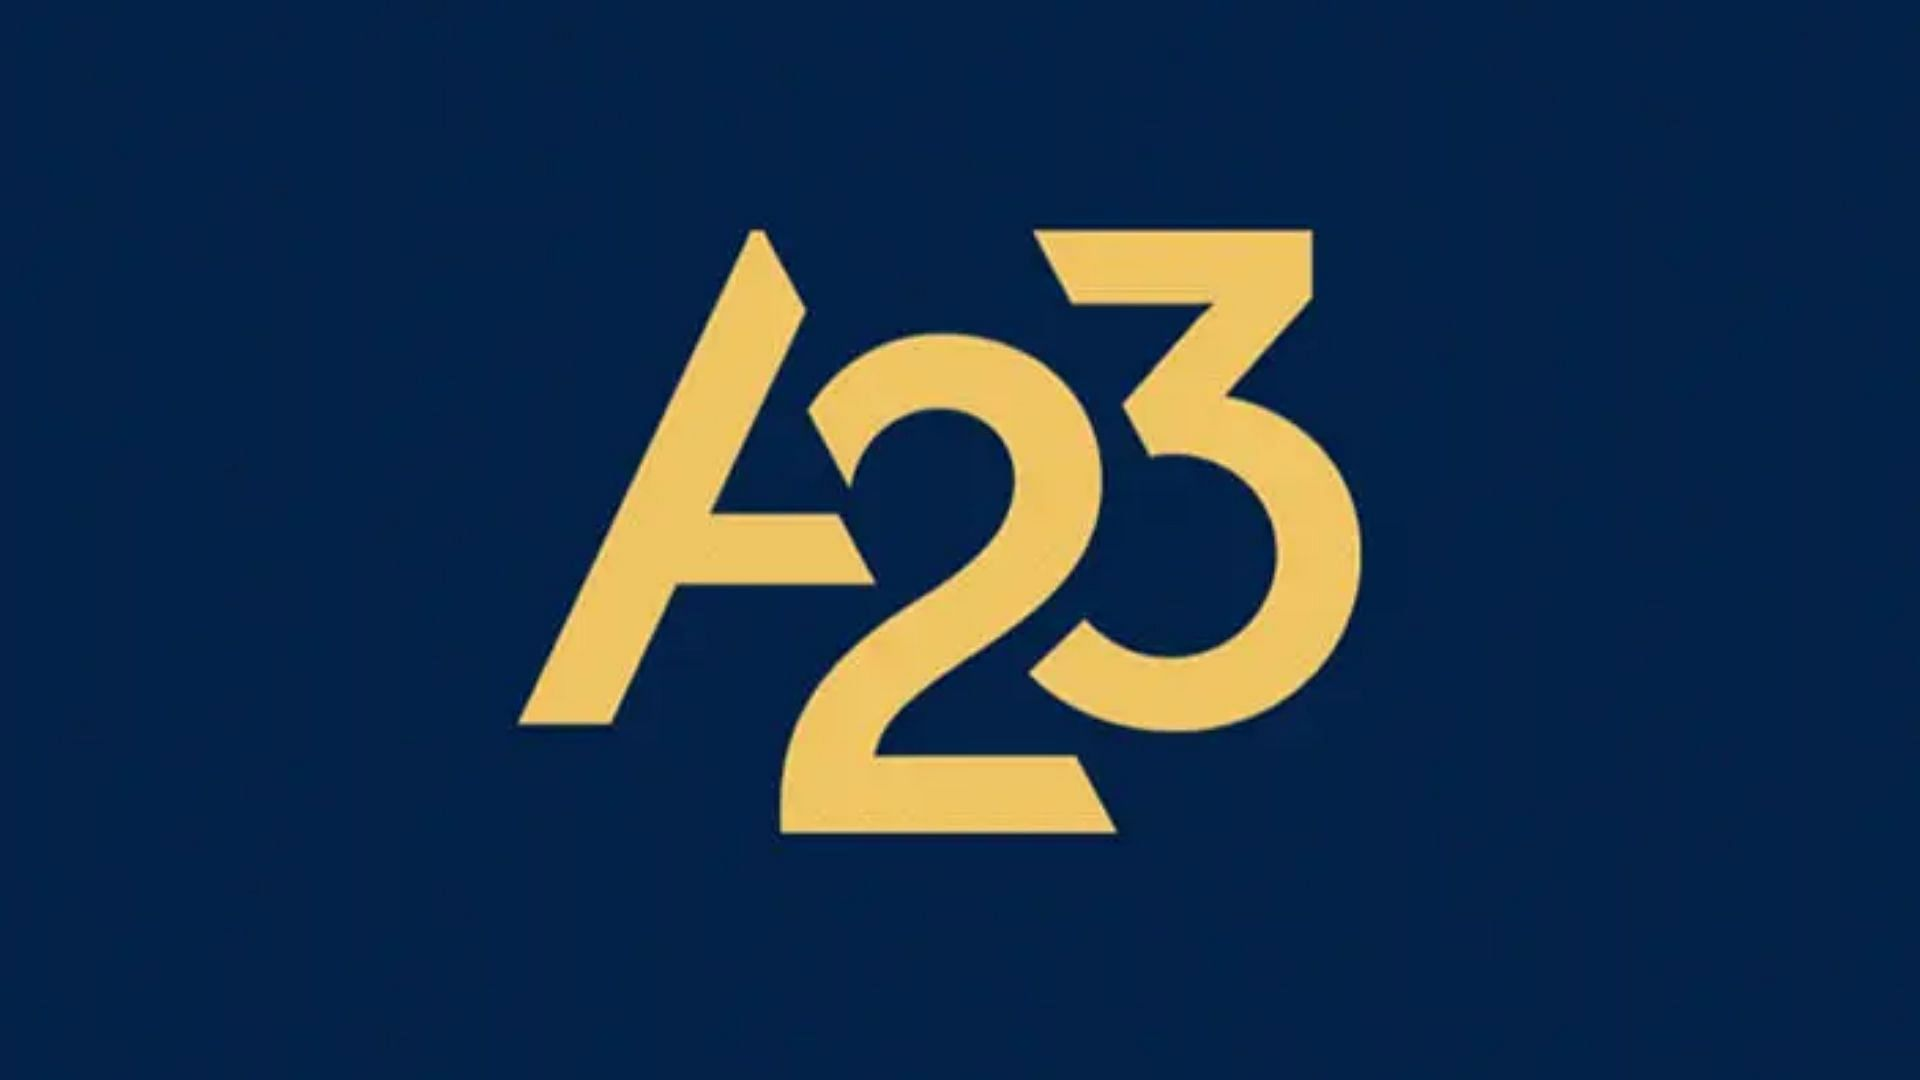 a23?blur=25